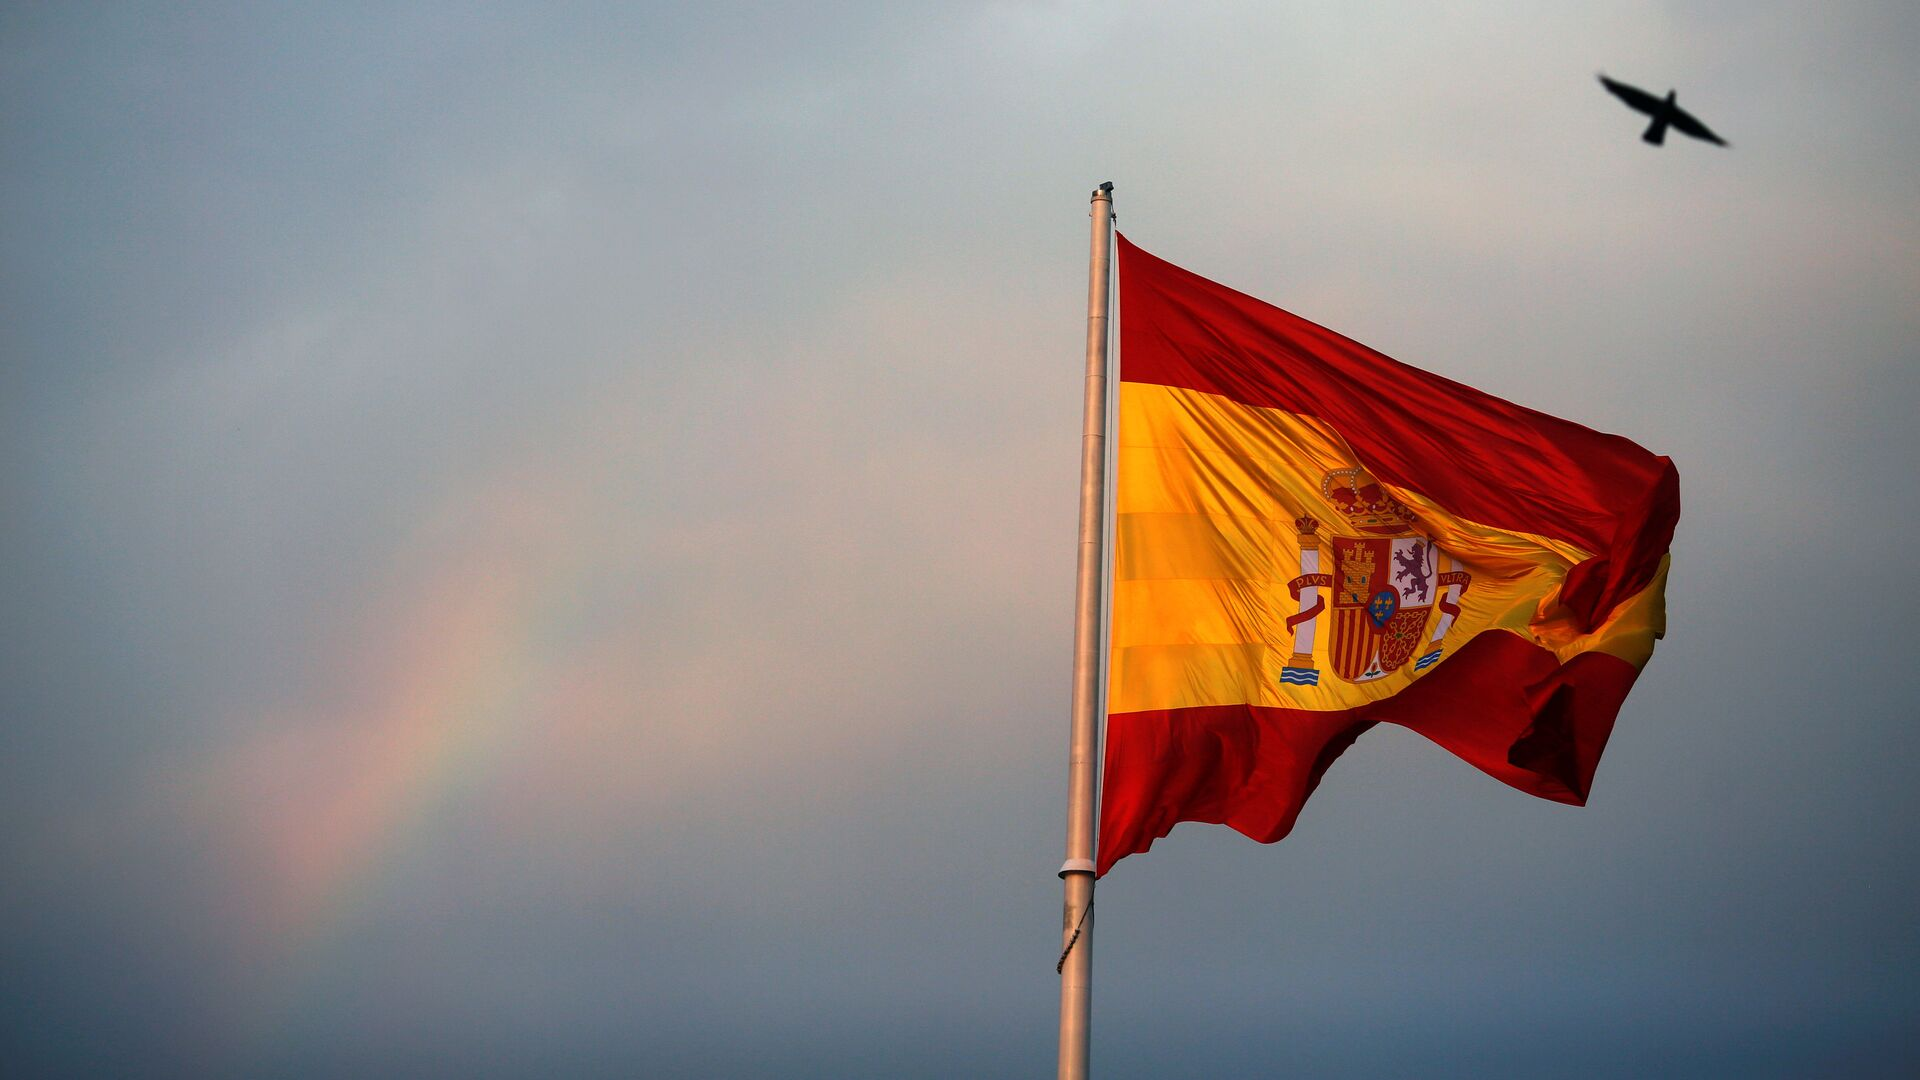 Bandera de España - Sputnik Mundo, 1920, 16.11.2018